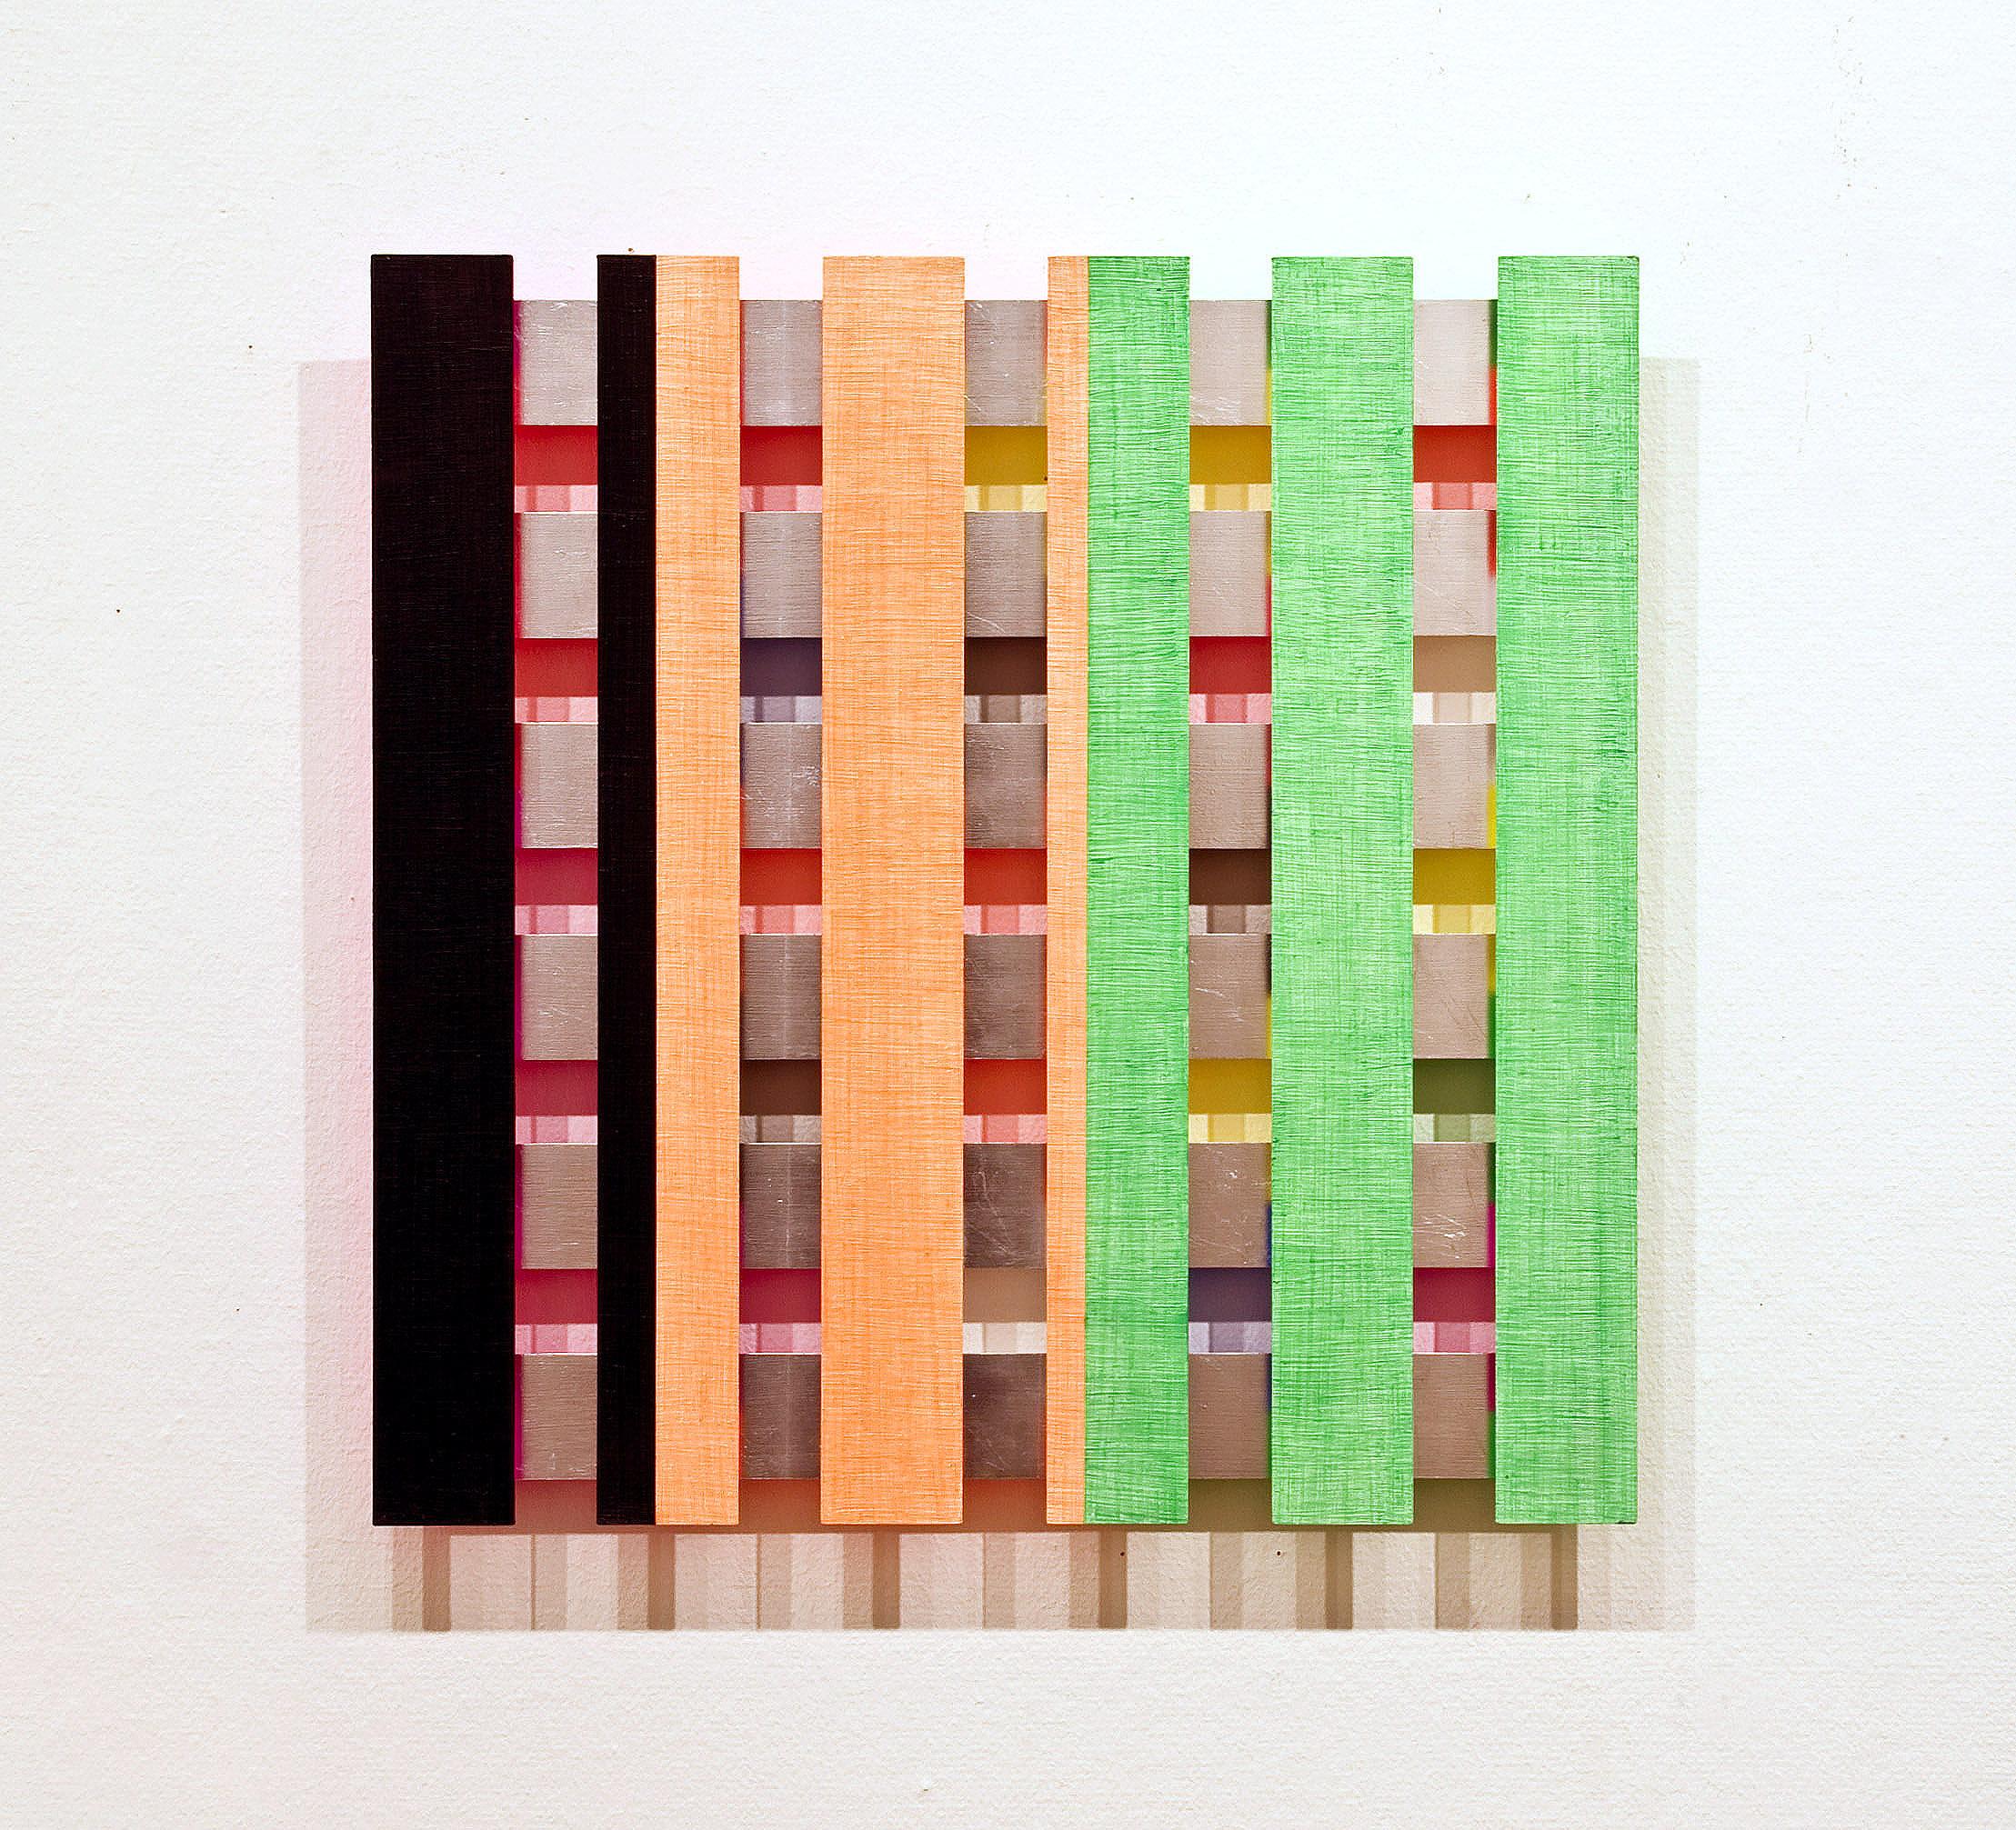 2l akril, les, 79 x 79 cm, 2009.jpg